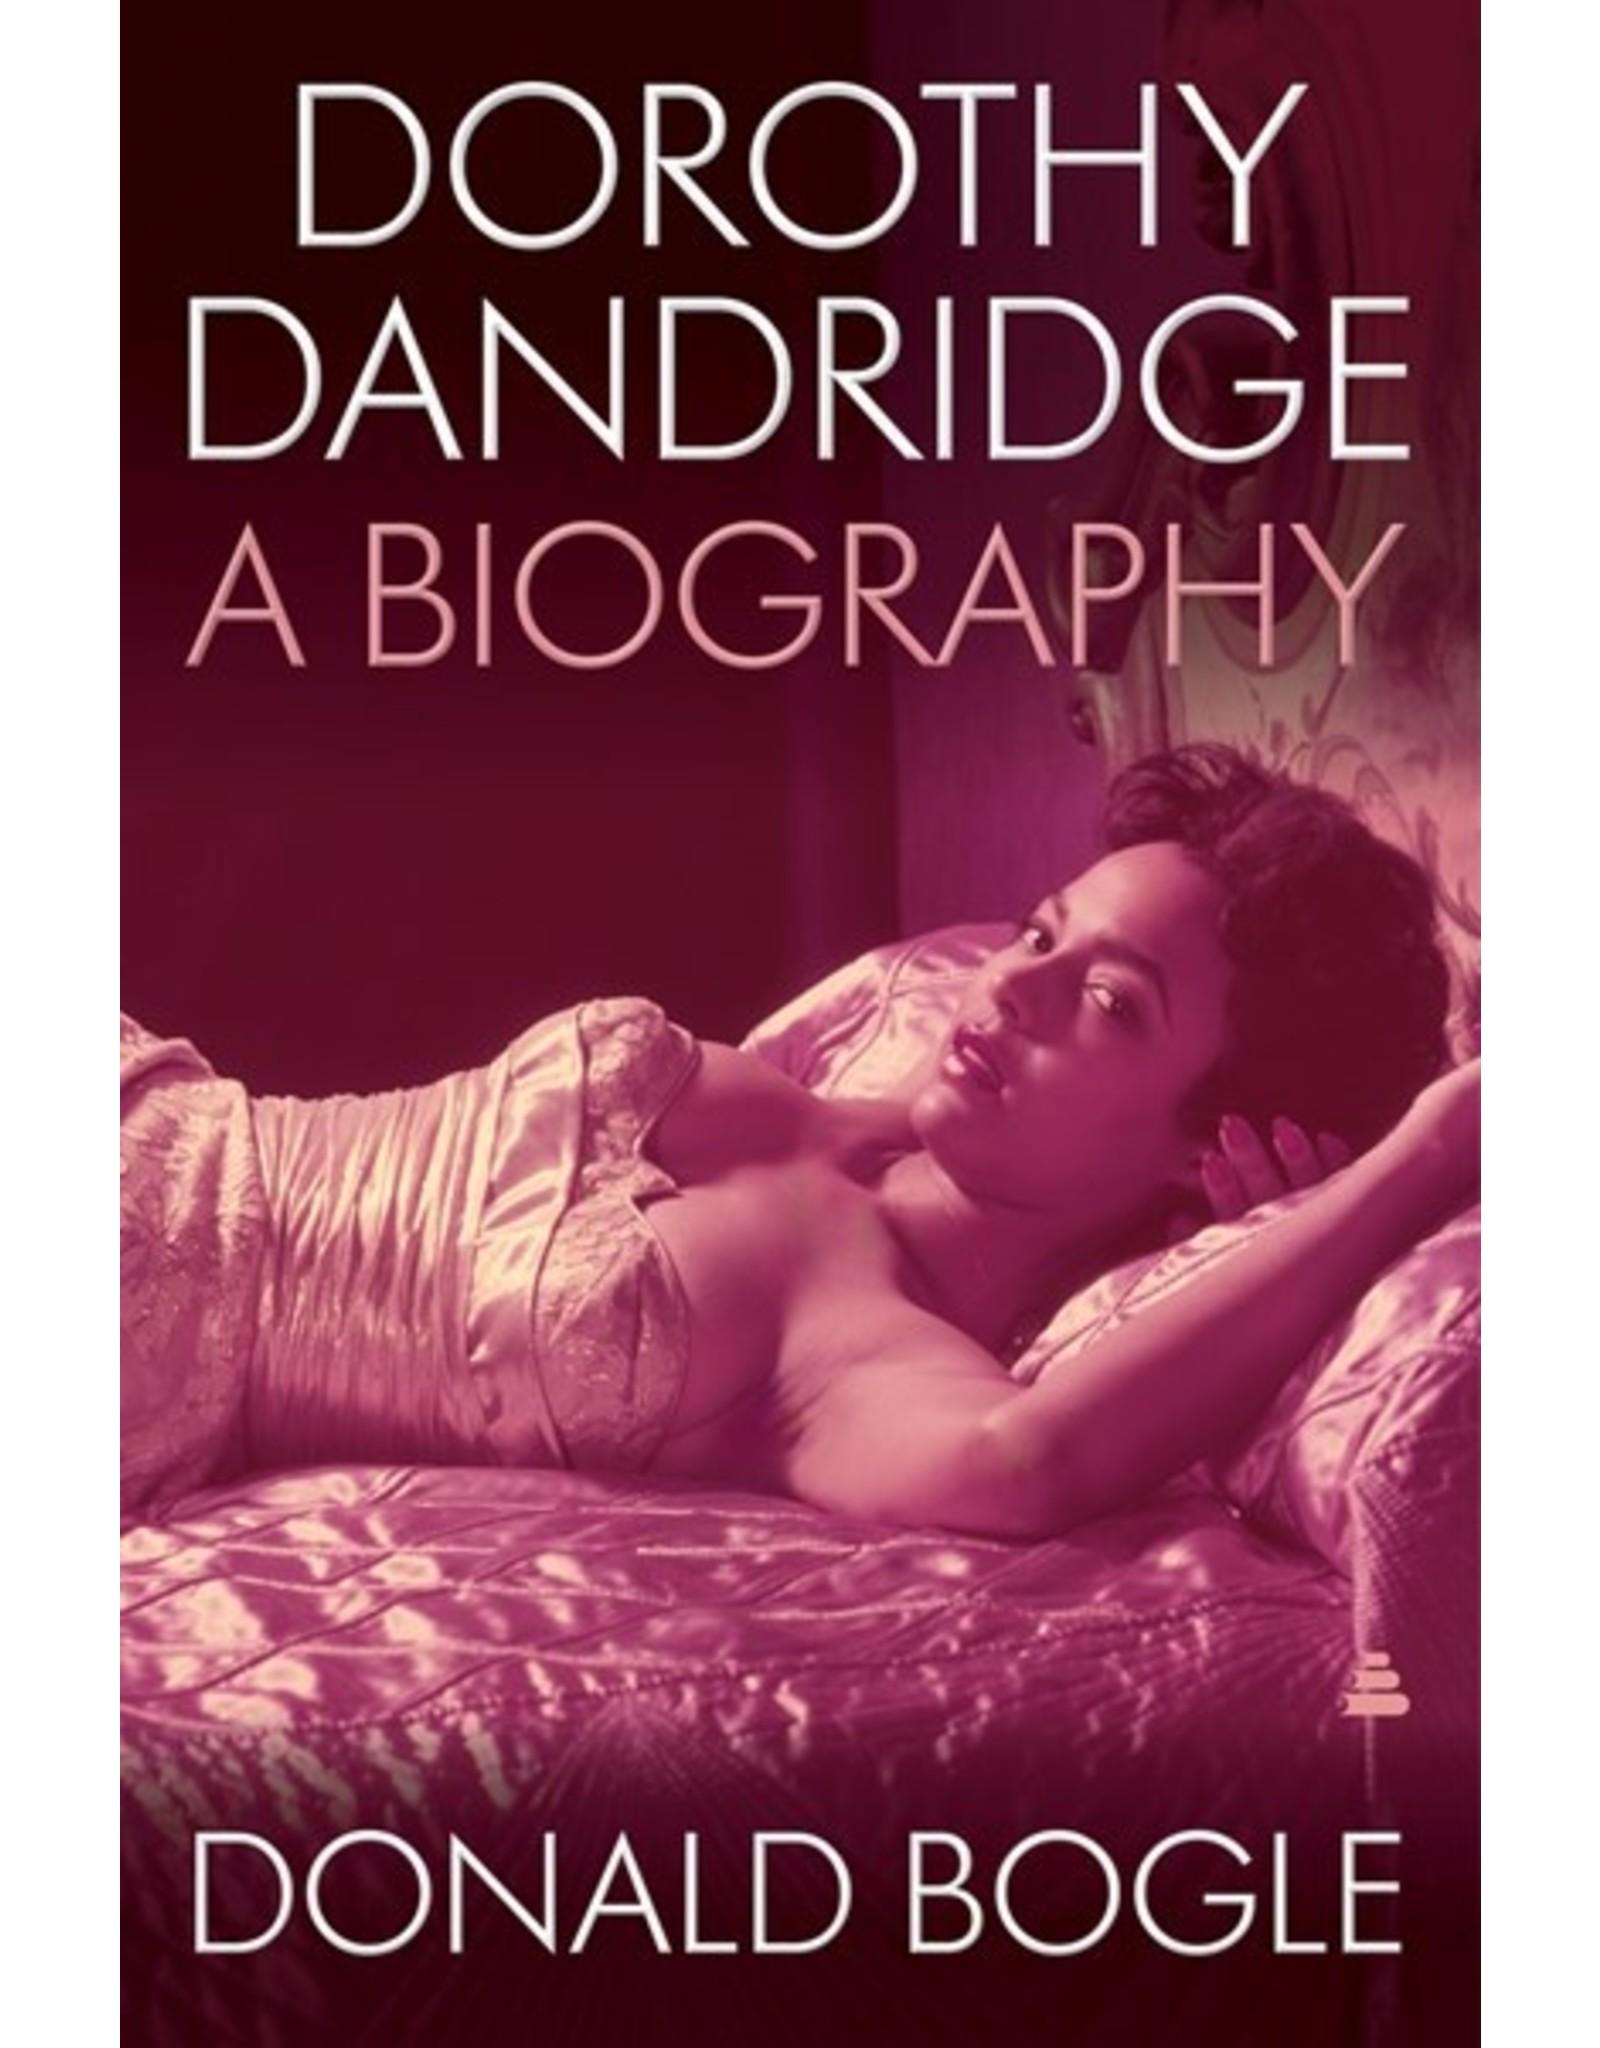 Books Dorothy Dandridge : A Biography by Donald Bogle